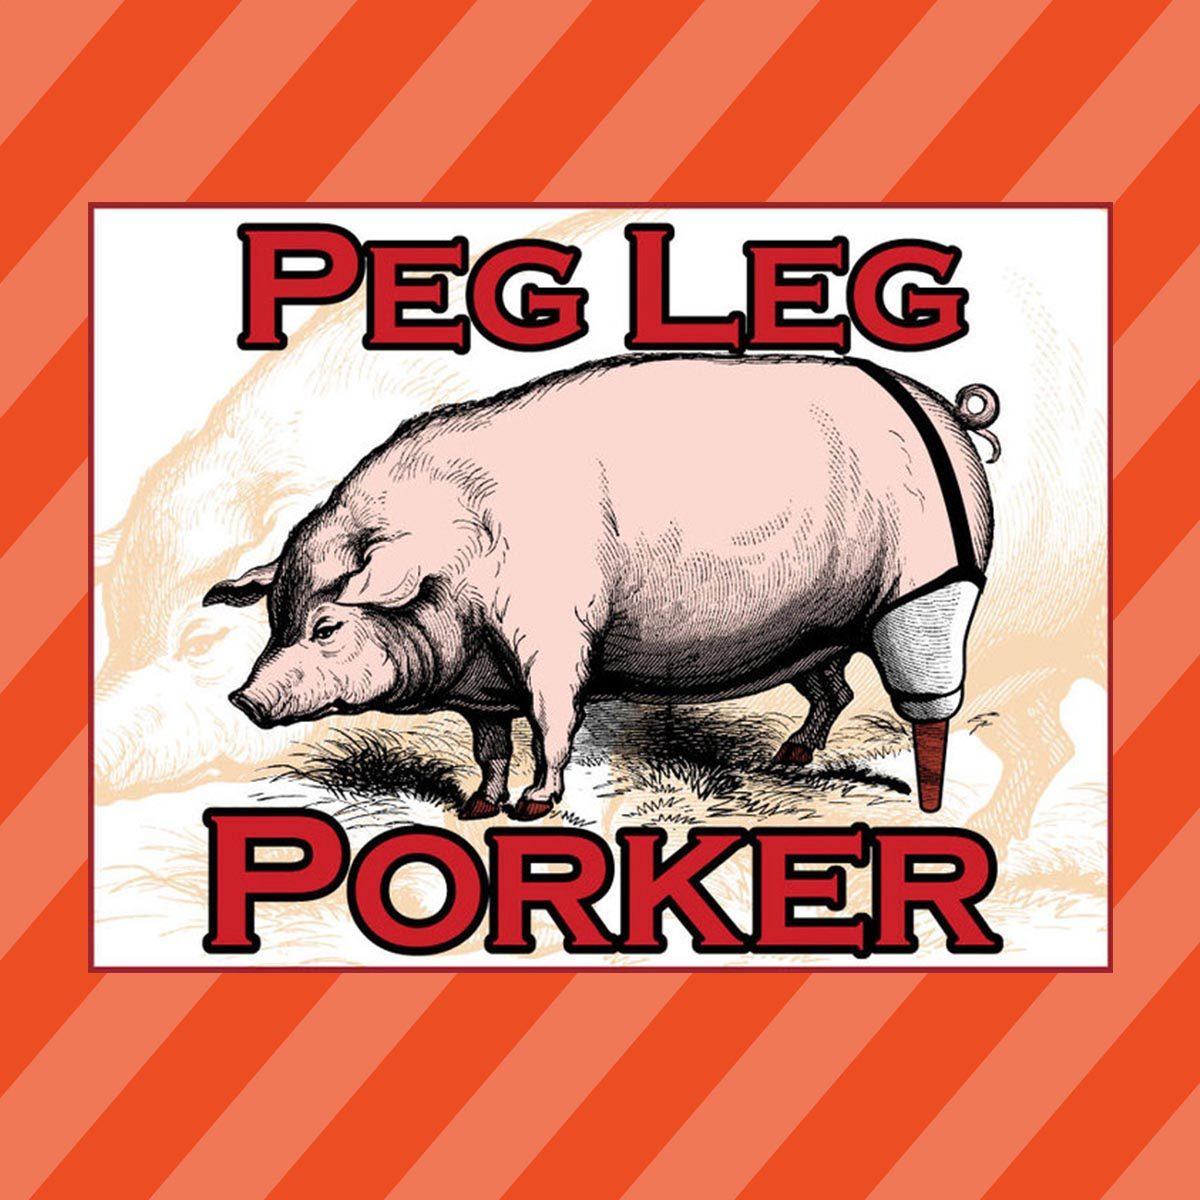 Peg Leg Porker